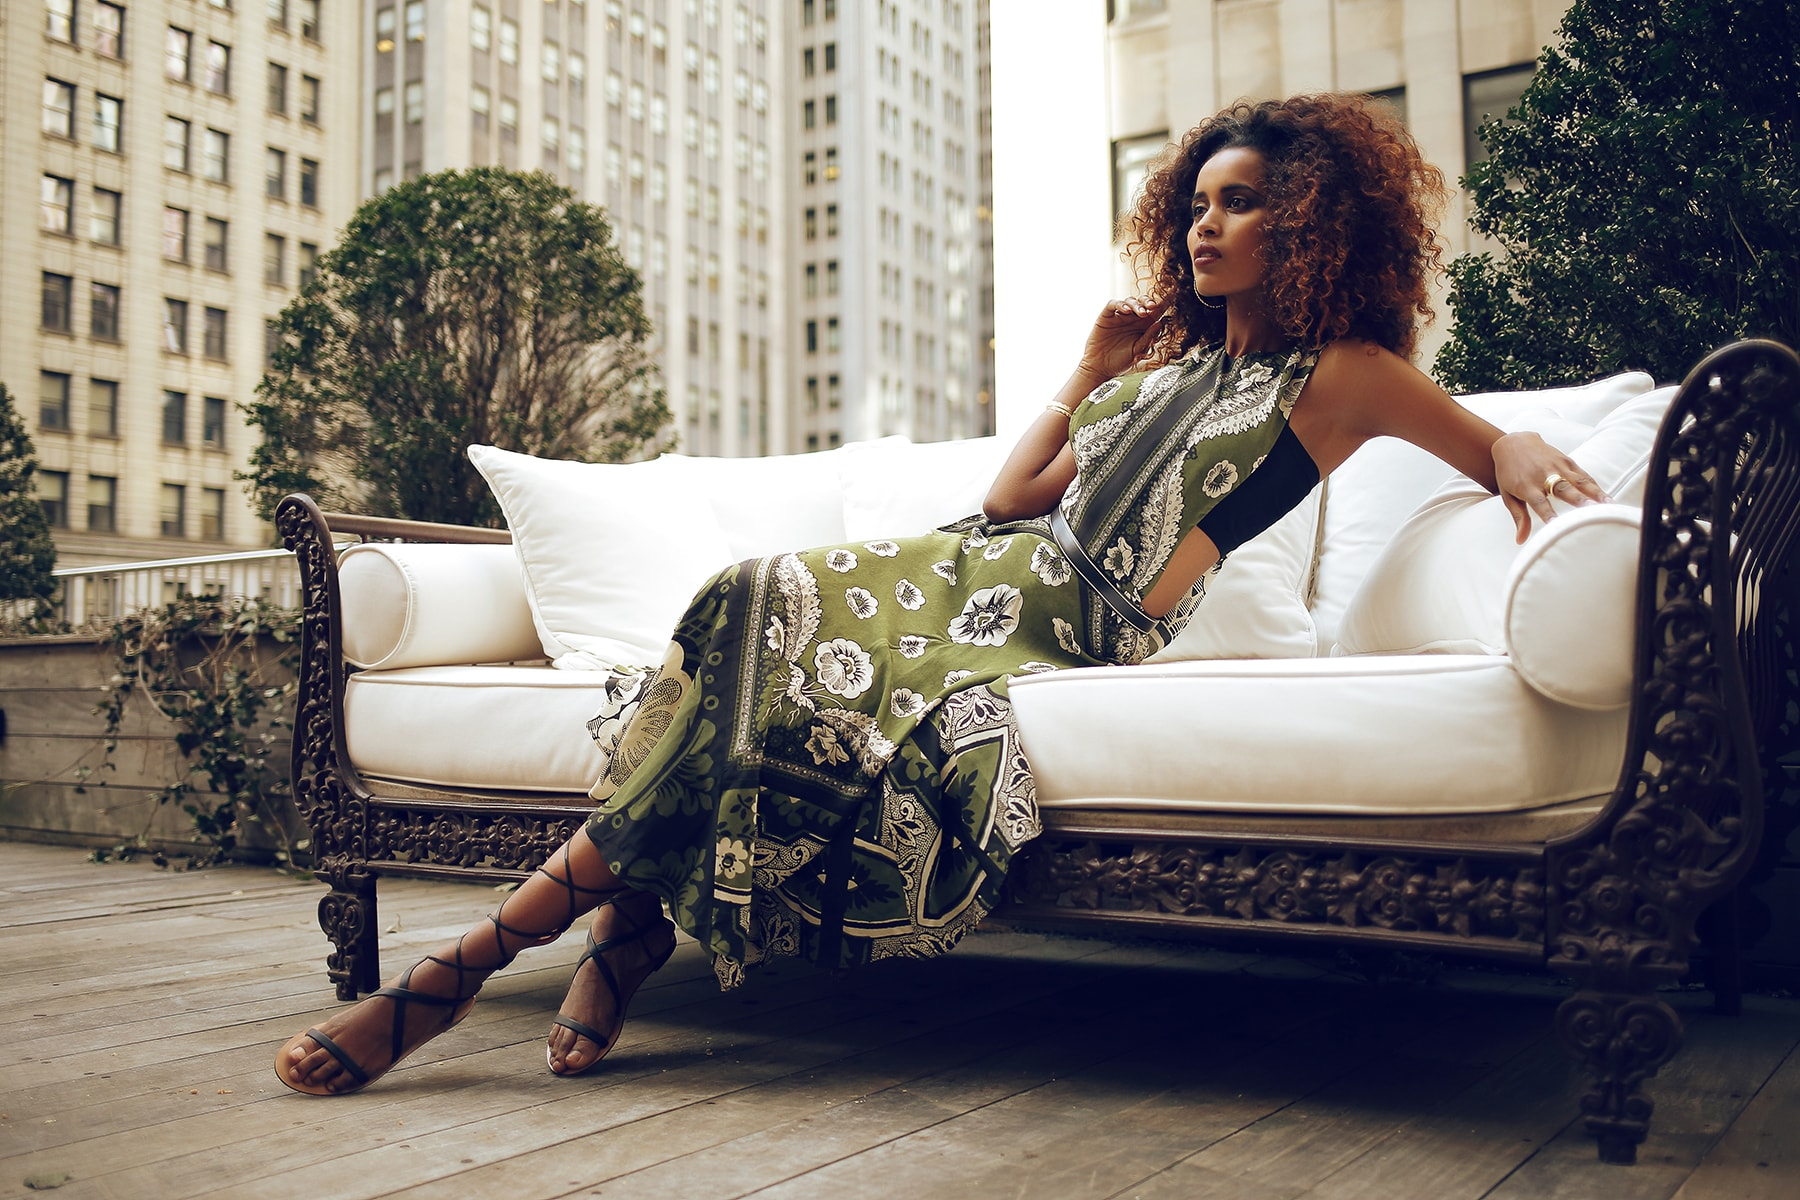 Fashion, photofashion, newyorkfashion, modenewyirk, photomodenyc, nycstylisme, cubriksnewyork,